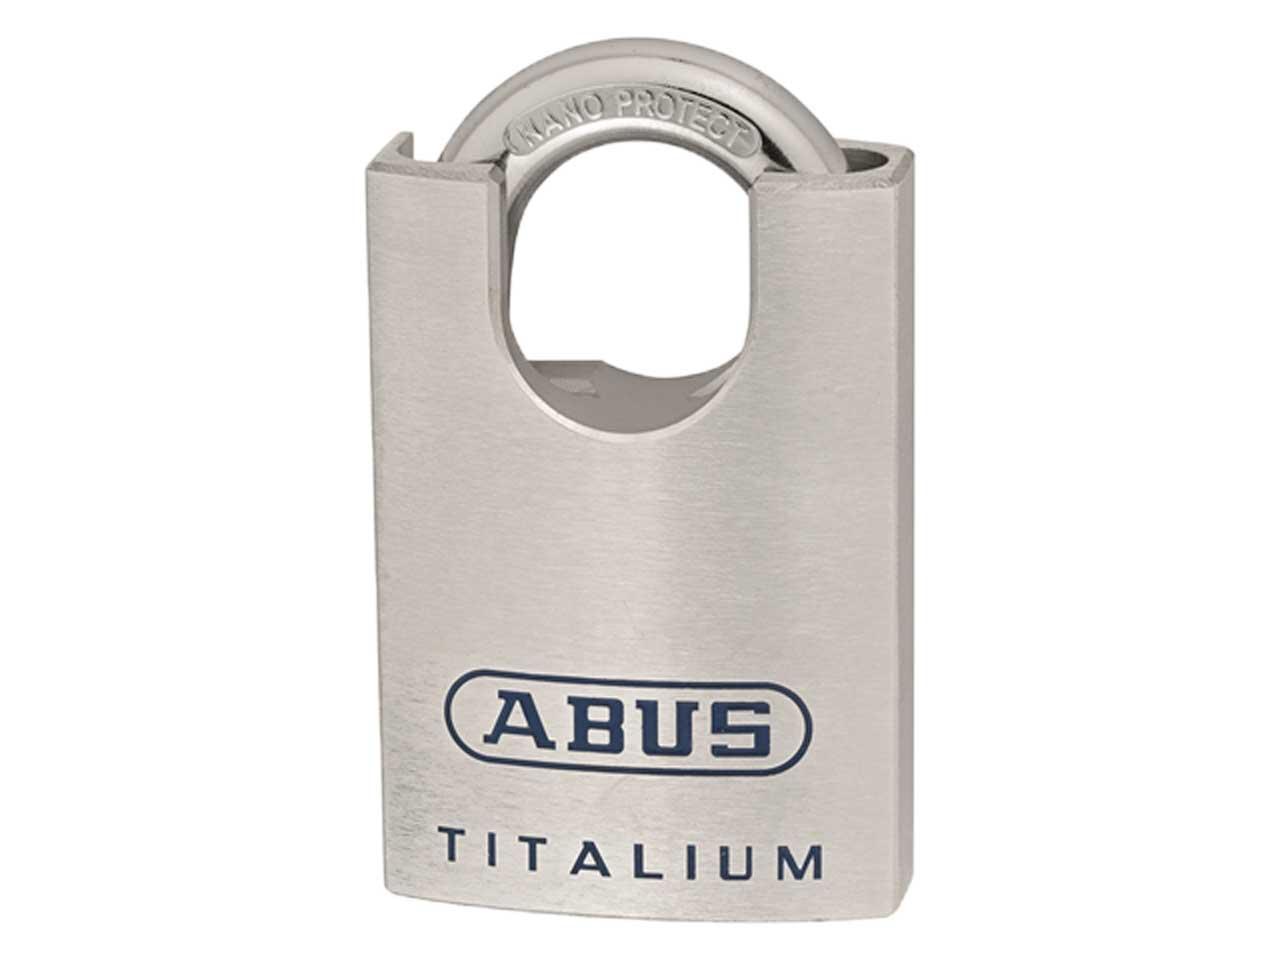 abus 96csti50b 50mm titalium closed shackle padlock. Black Bedroom Furniture Sets. Home Design Ideas